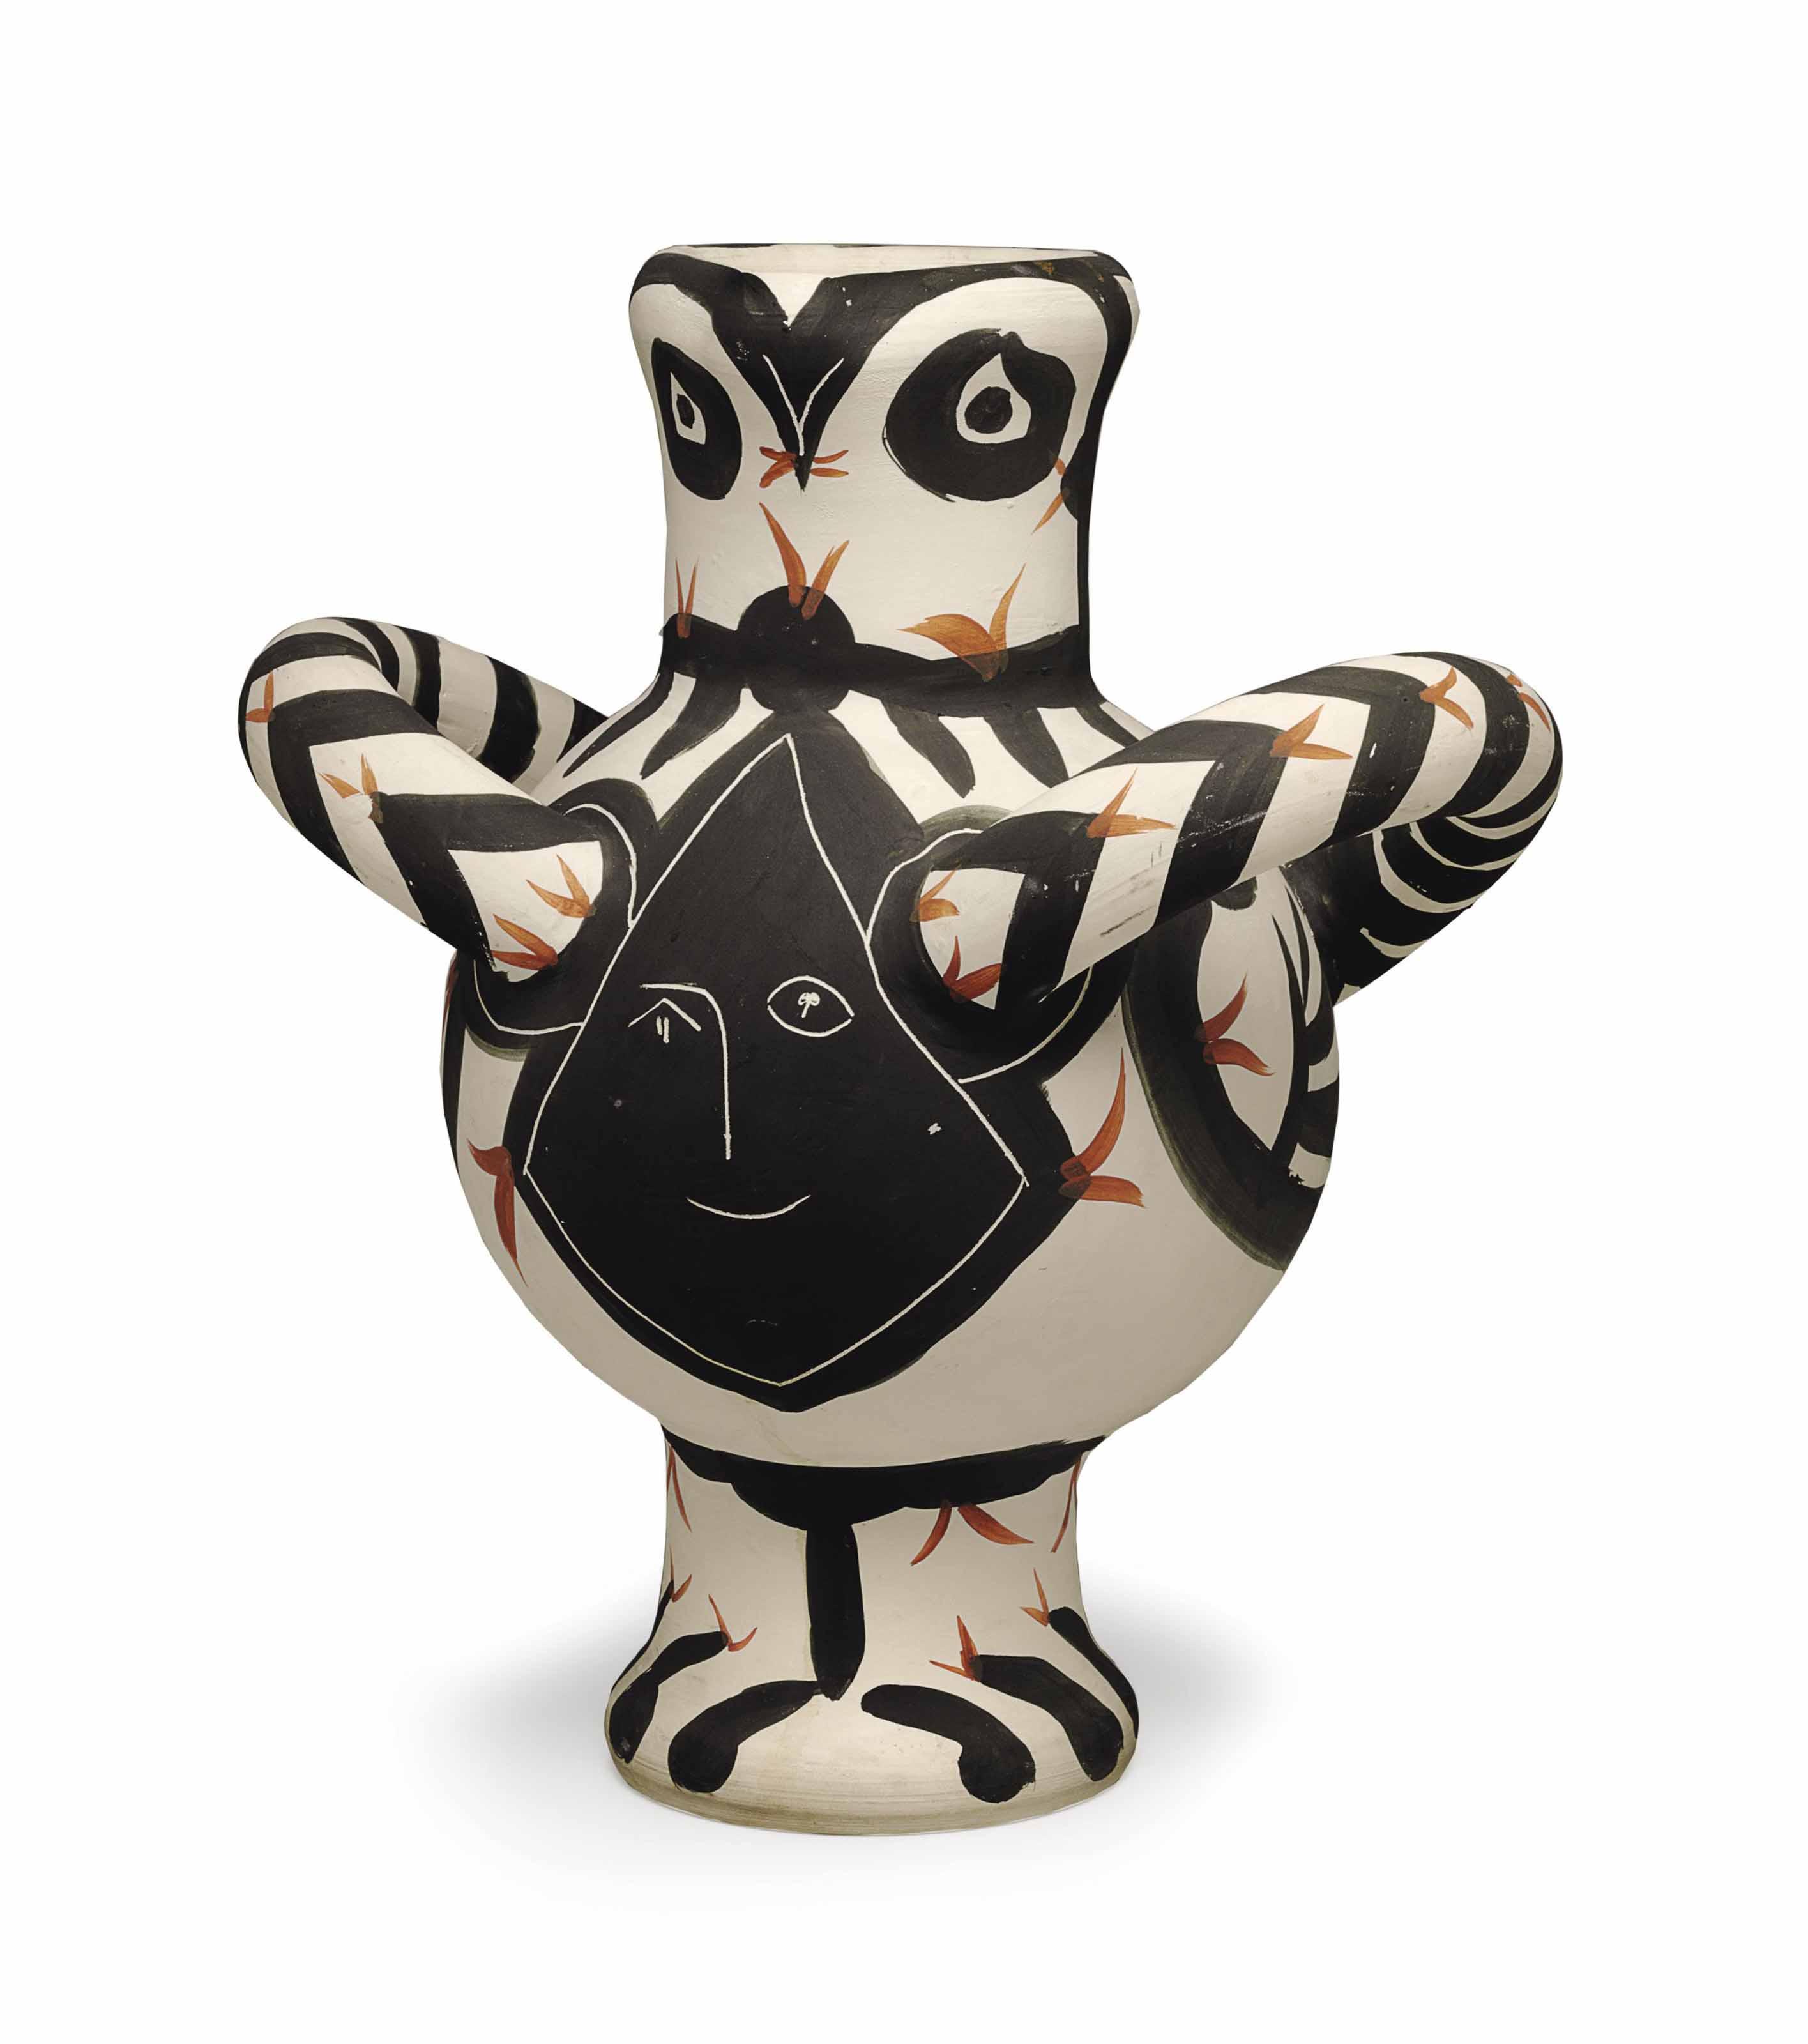 Audio: Pablo Picasso, Large Bird, Black Face